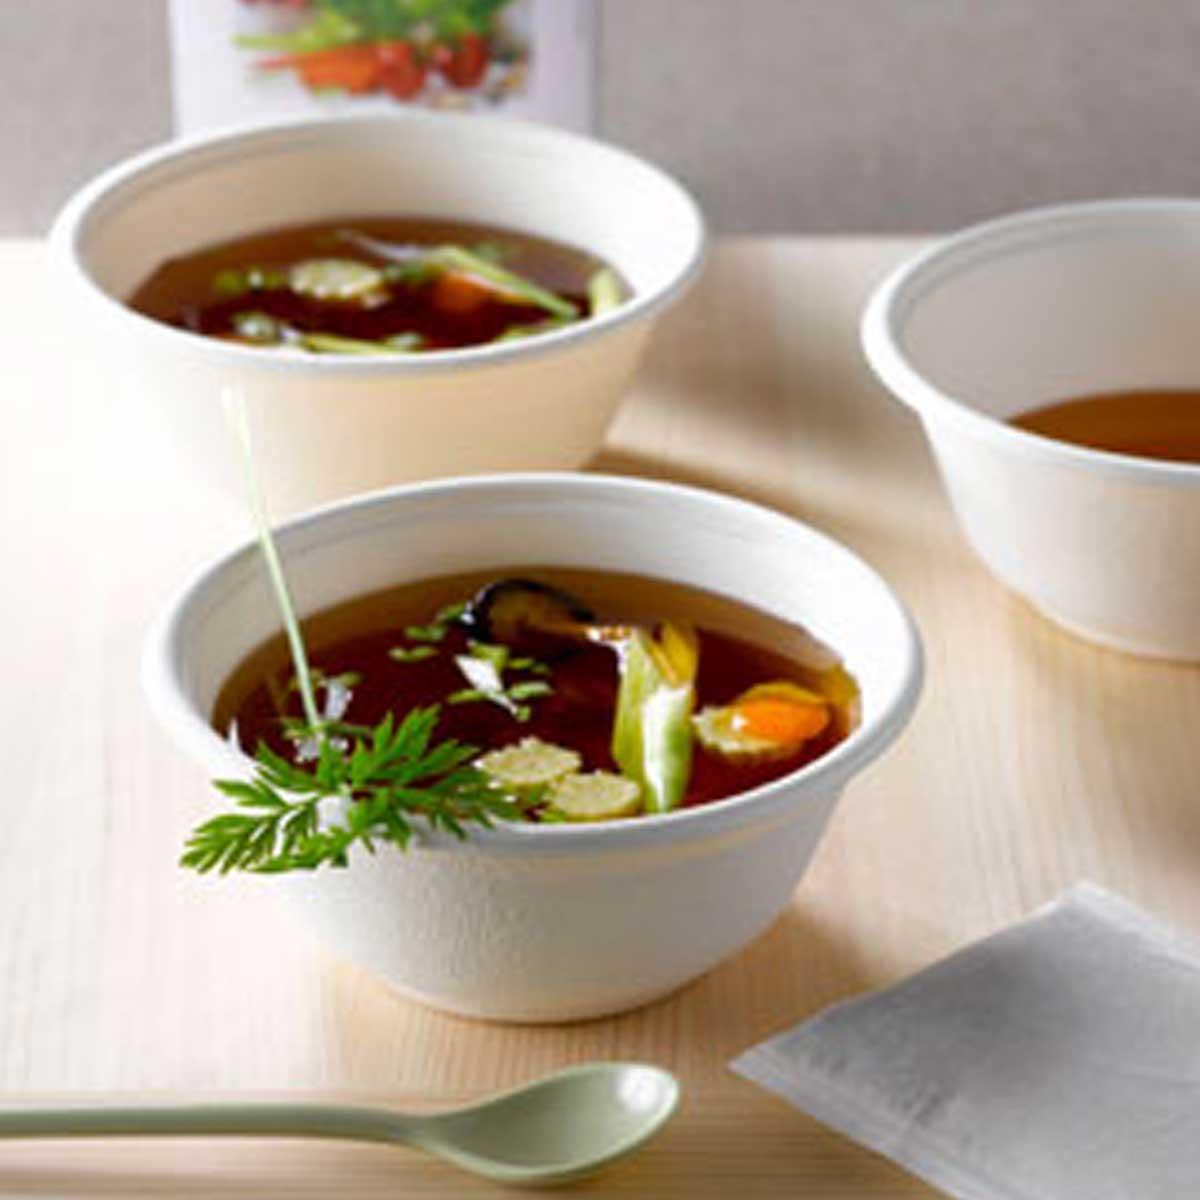 recette soupe japonaise revigorante cuisine madame figaro. Black Bedroom Furniture Sets. Home Design Ideas